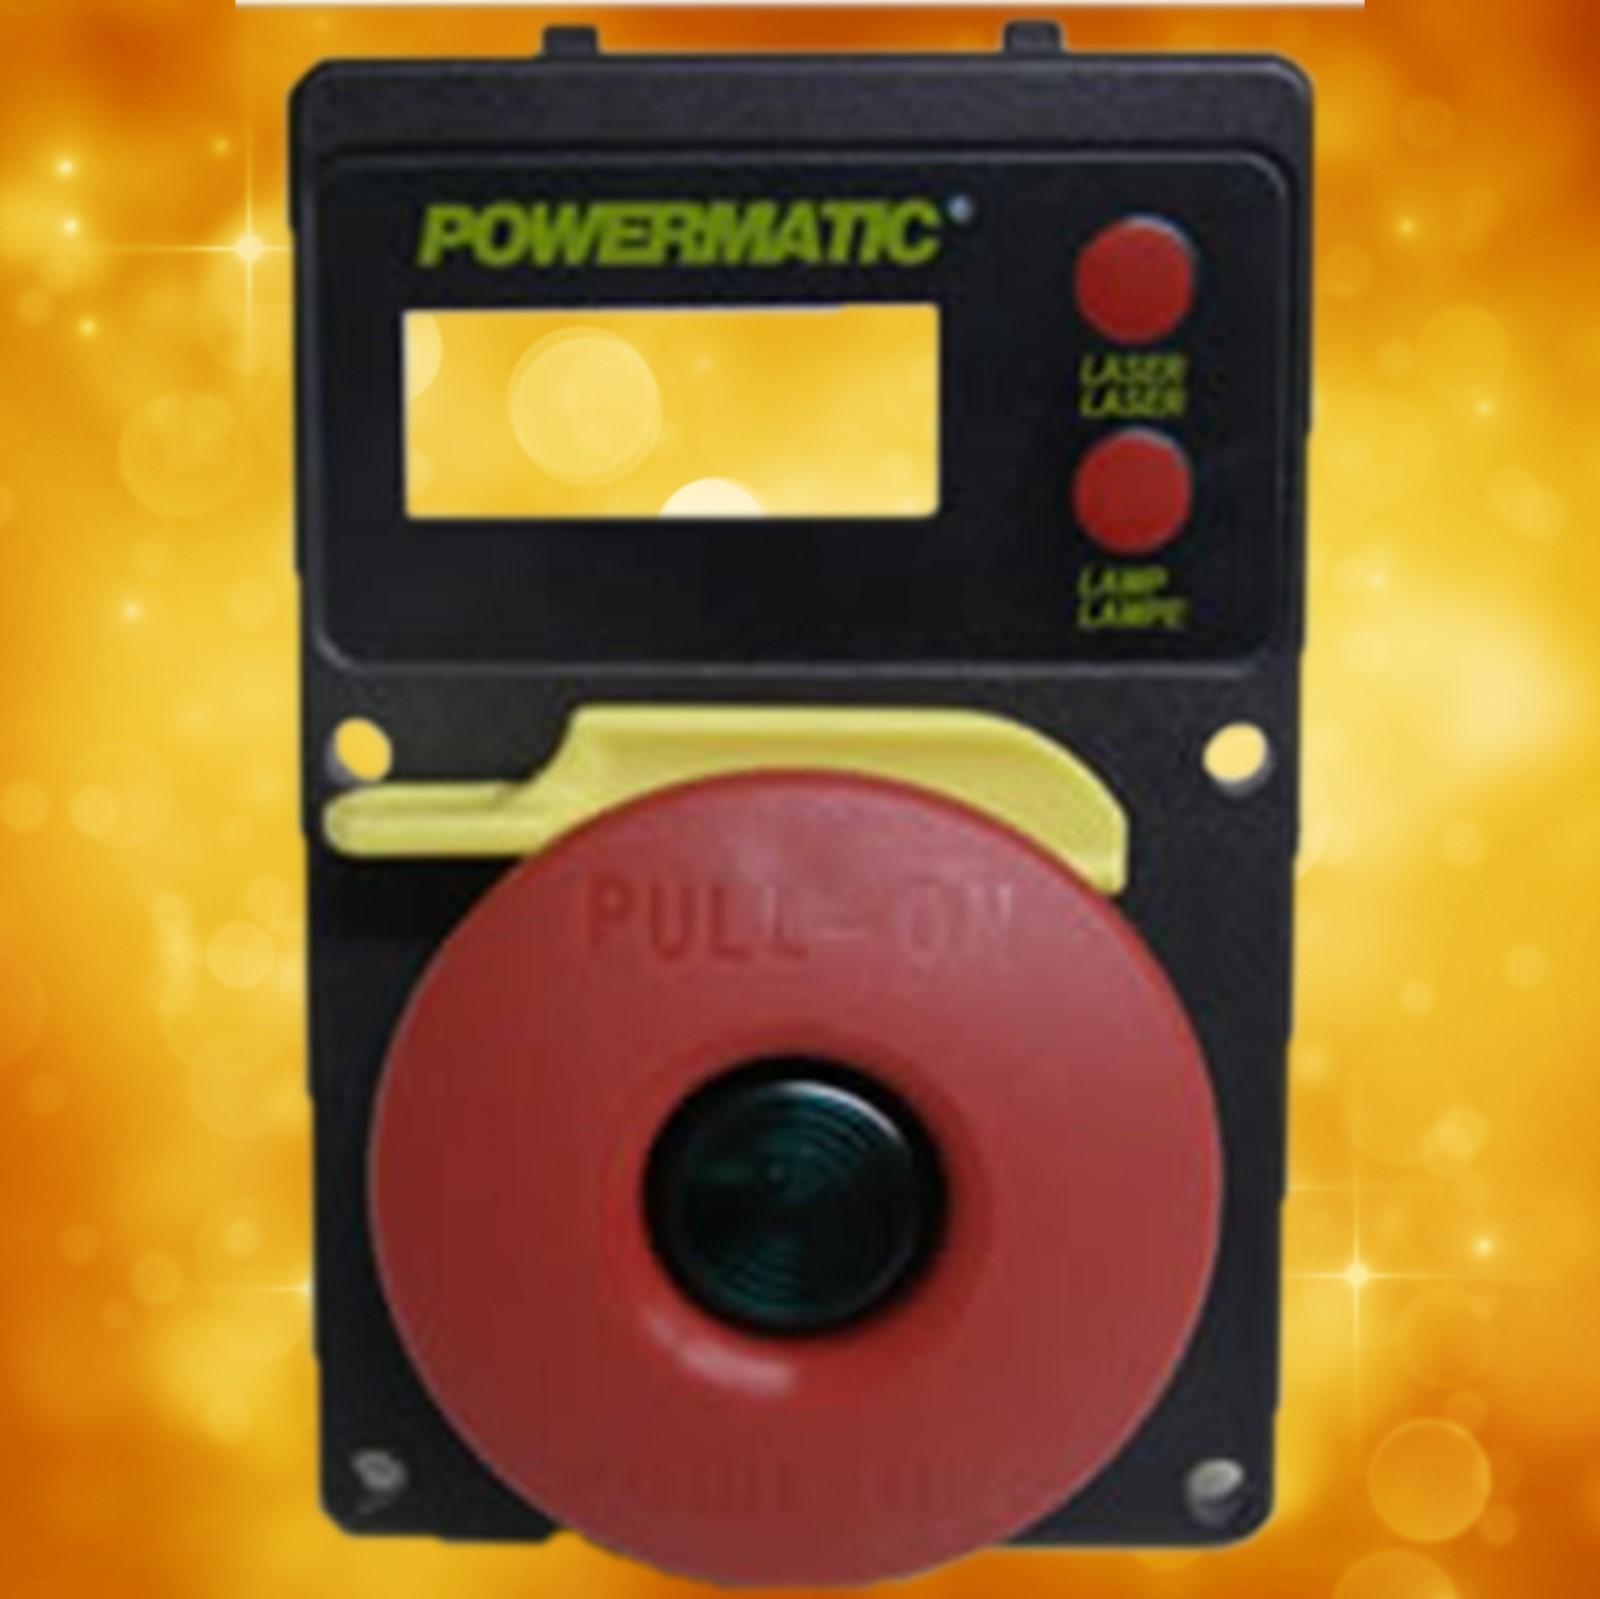 Powermatic Parts | MikesTools com - Mike's Tools